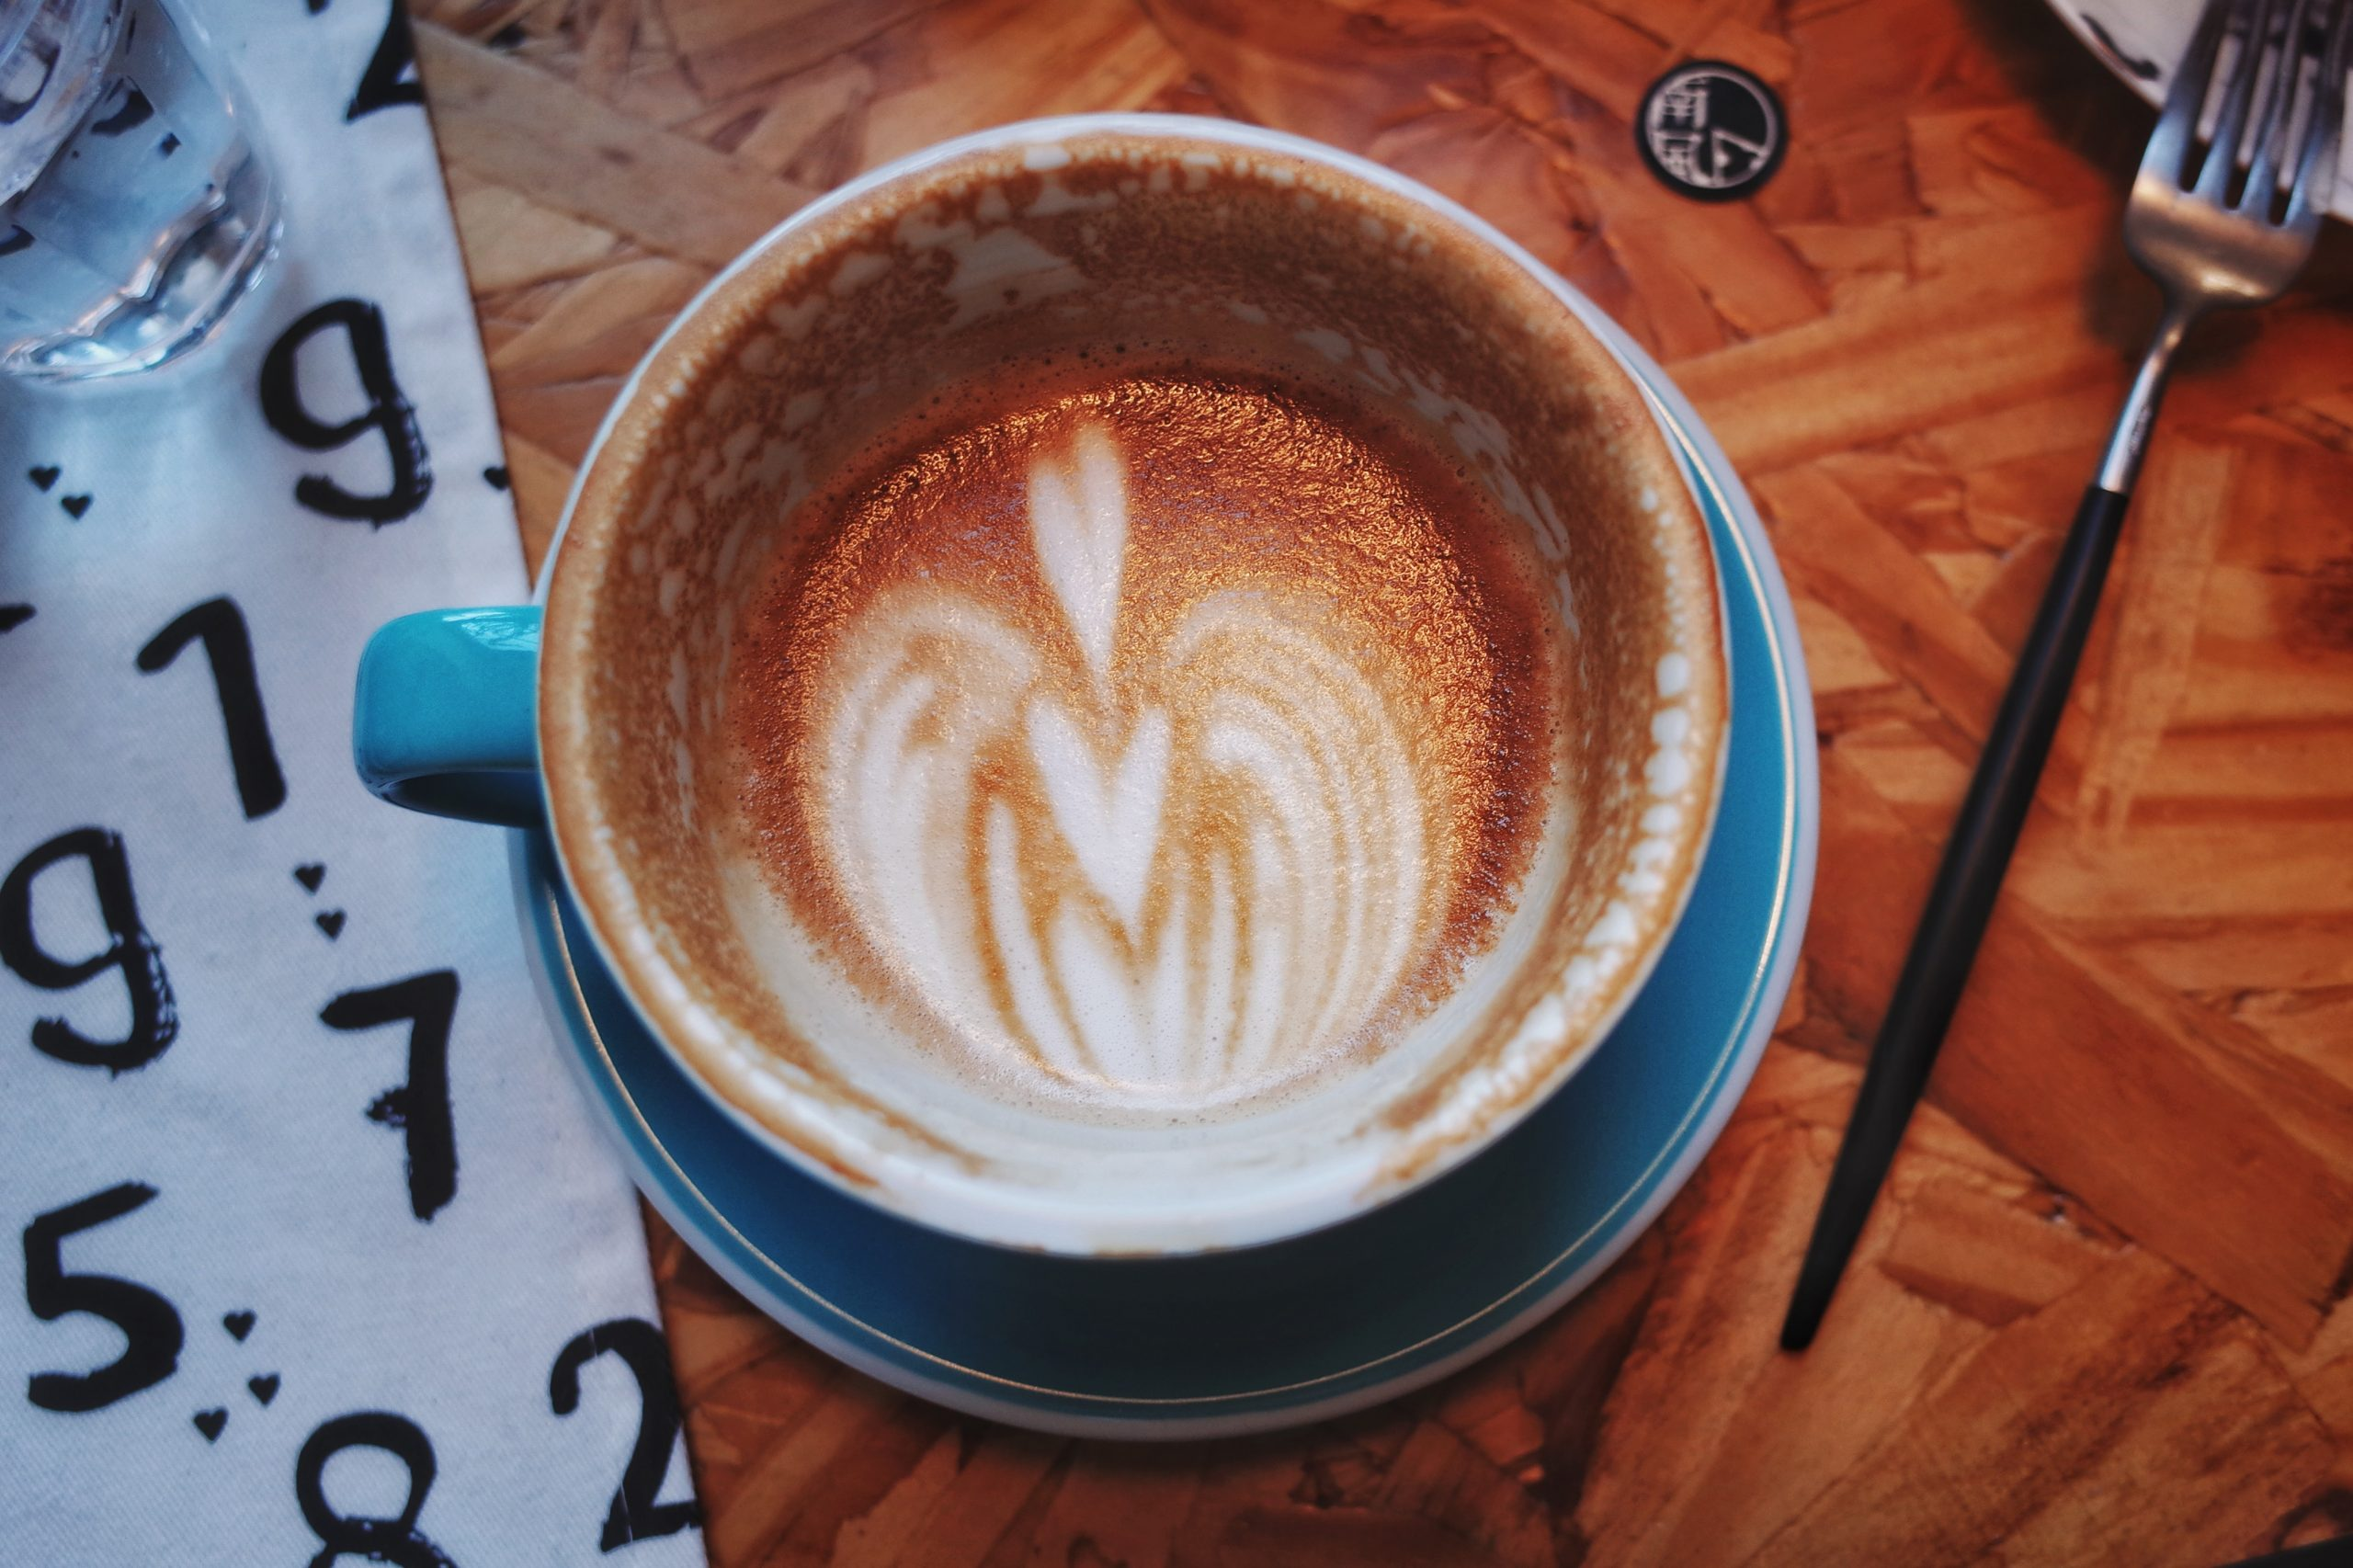 20 Foods Harmful to Dogs - caffeine